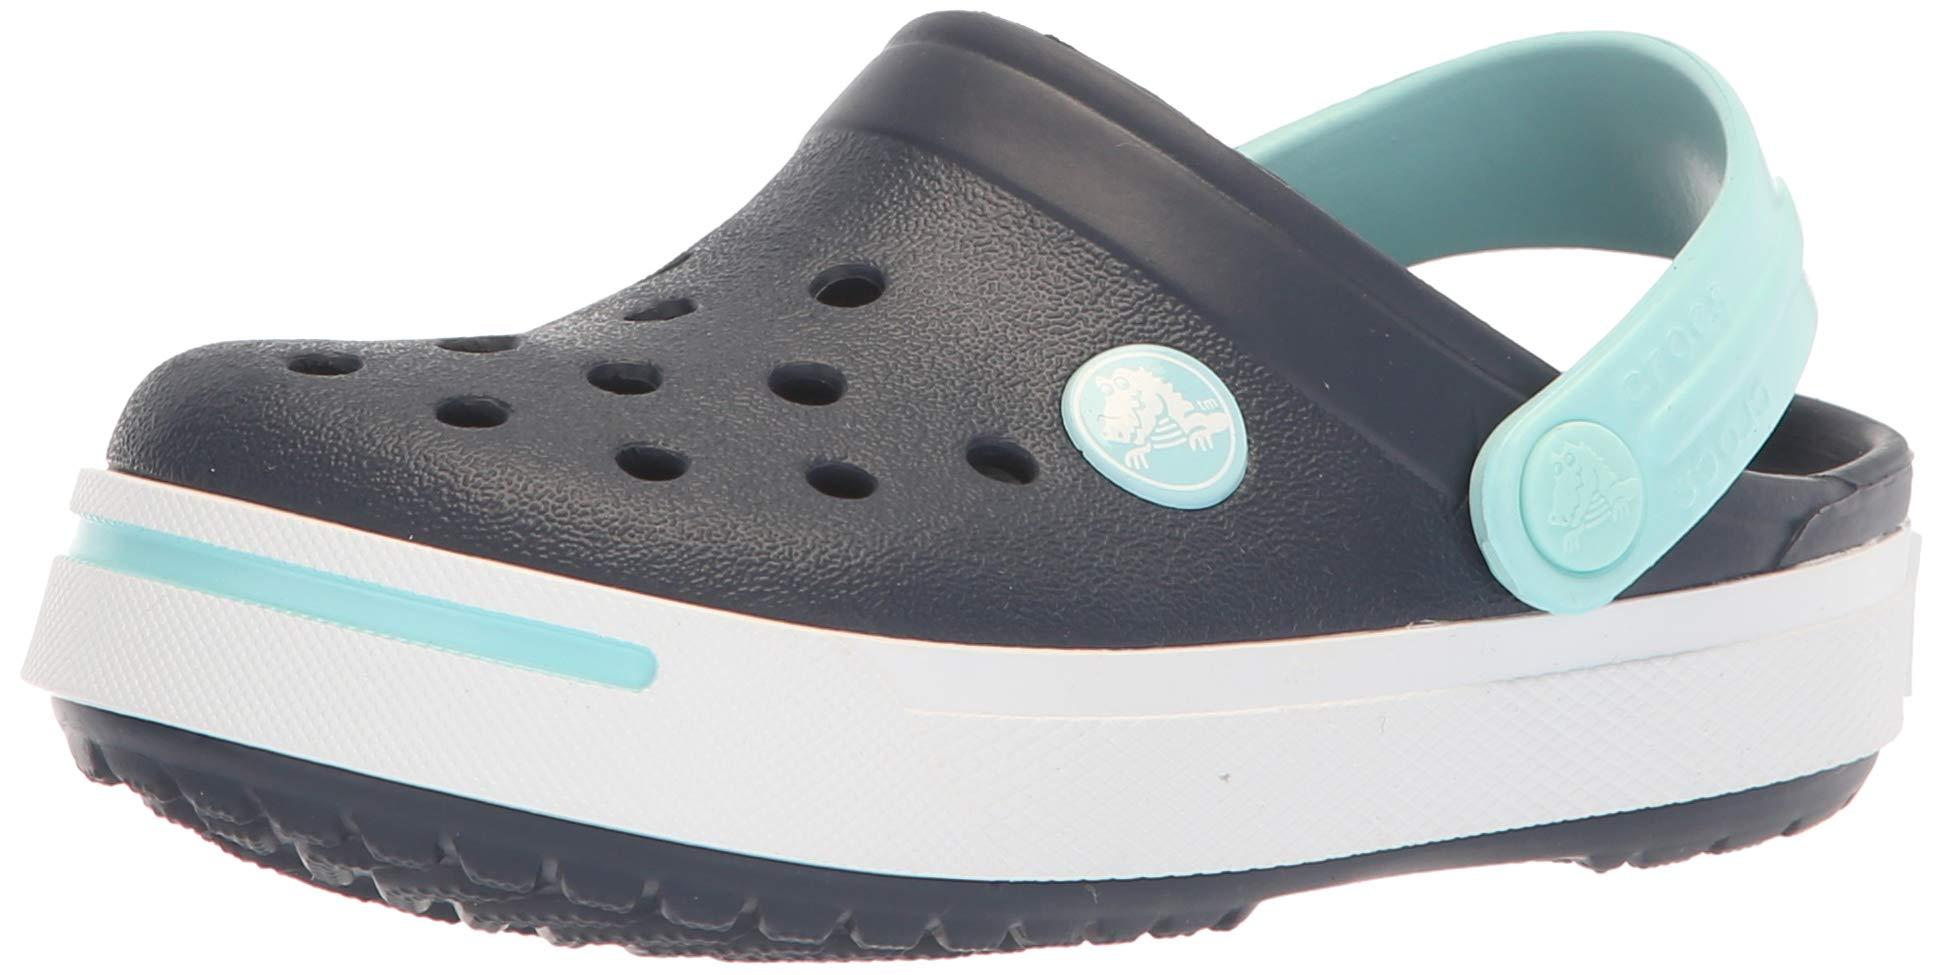 Crocs Unisex Crocband II Clog Shoe Navy/Ice Blue Little Kid Size 12-13